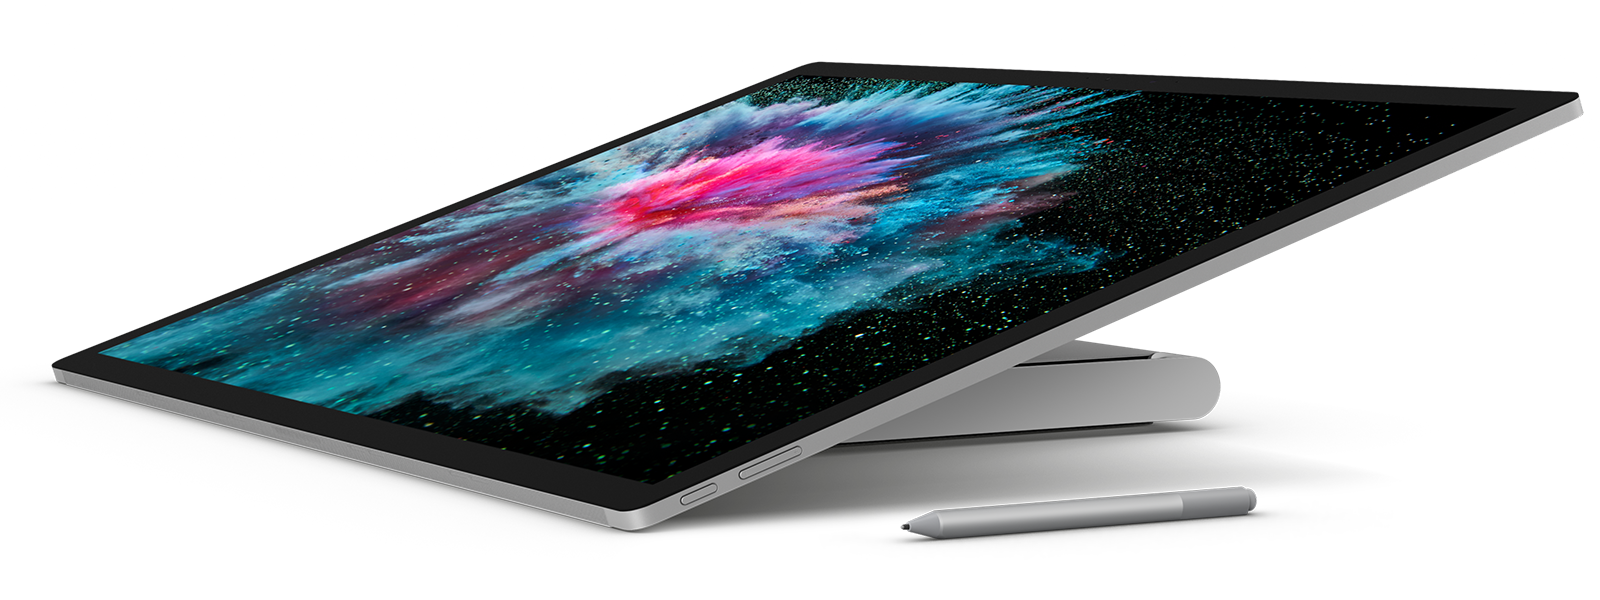 شكل جانبي لـ Surface Studio 2 في وضع Studio مع قلم Surface Pen